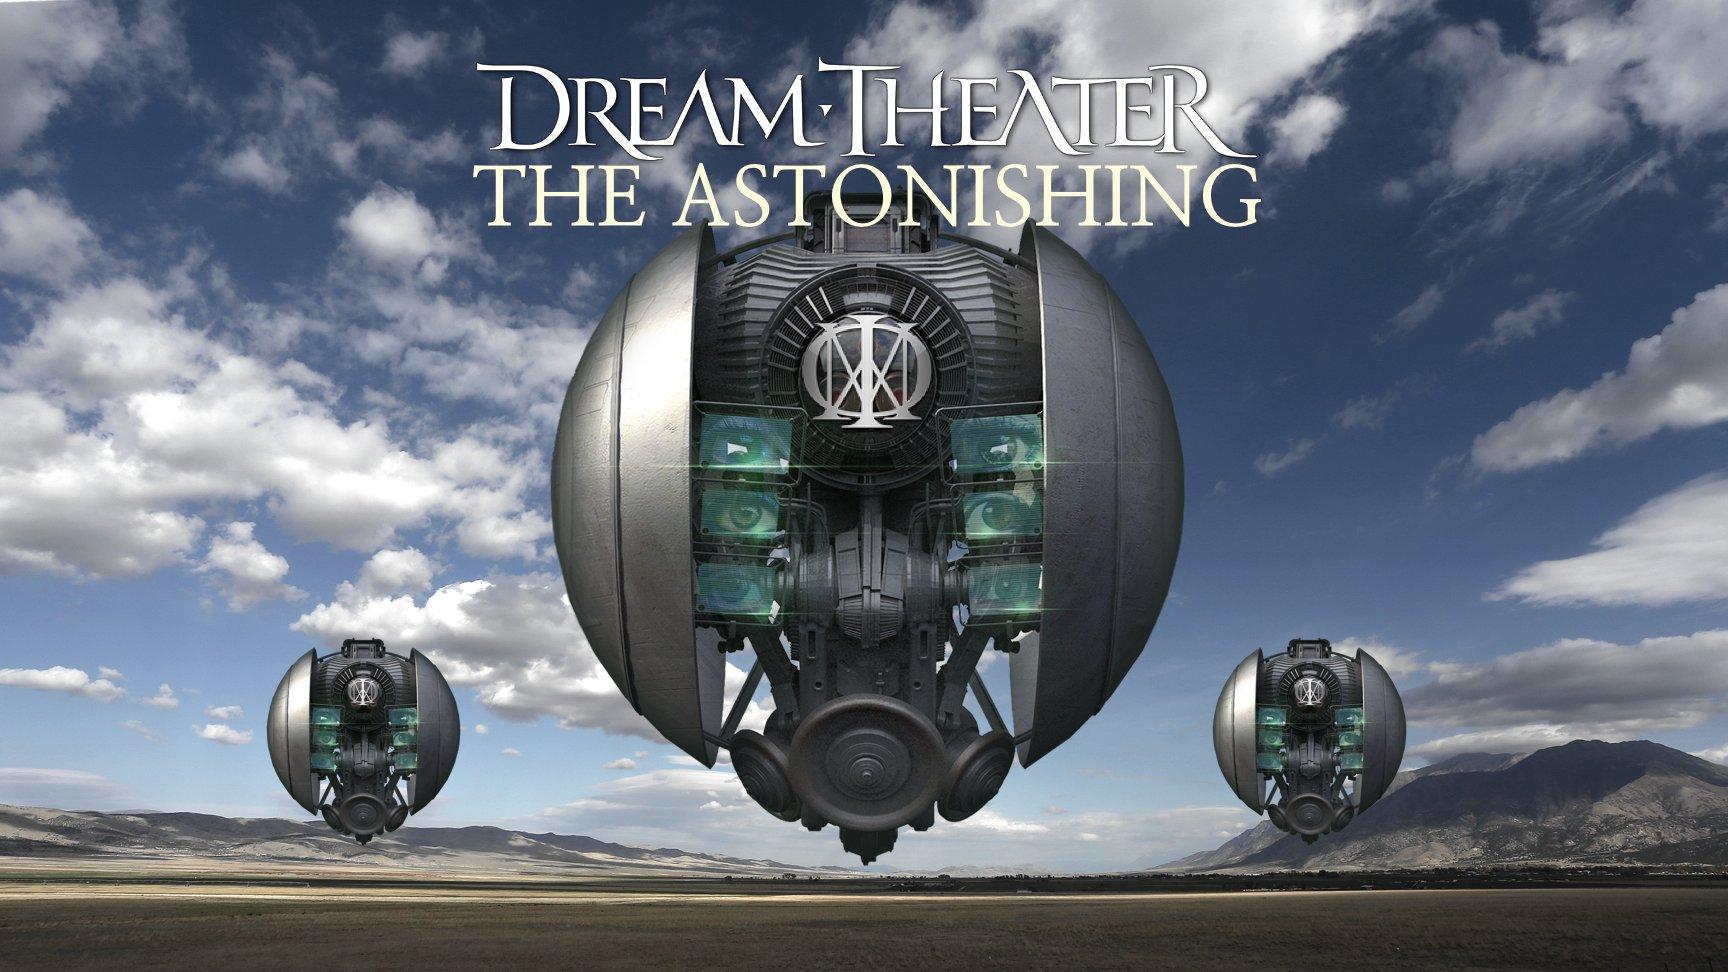 The Astonishing - Dream Theater - Recensione